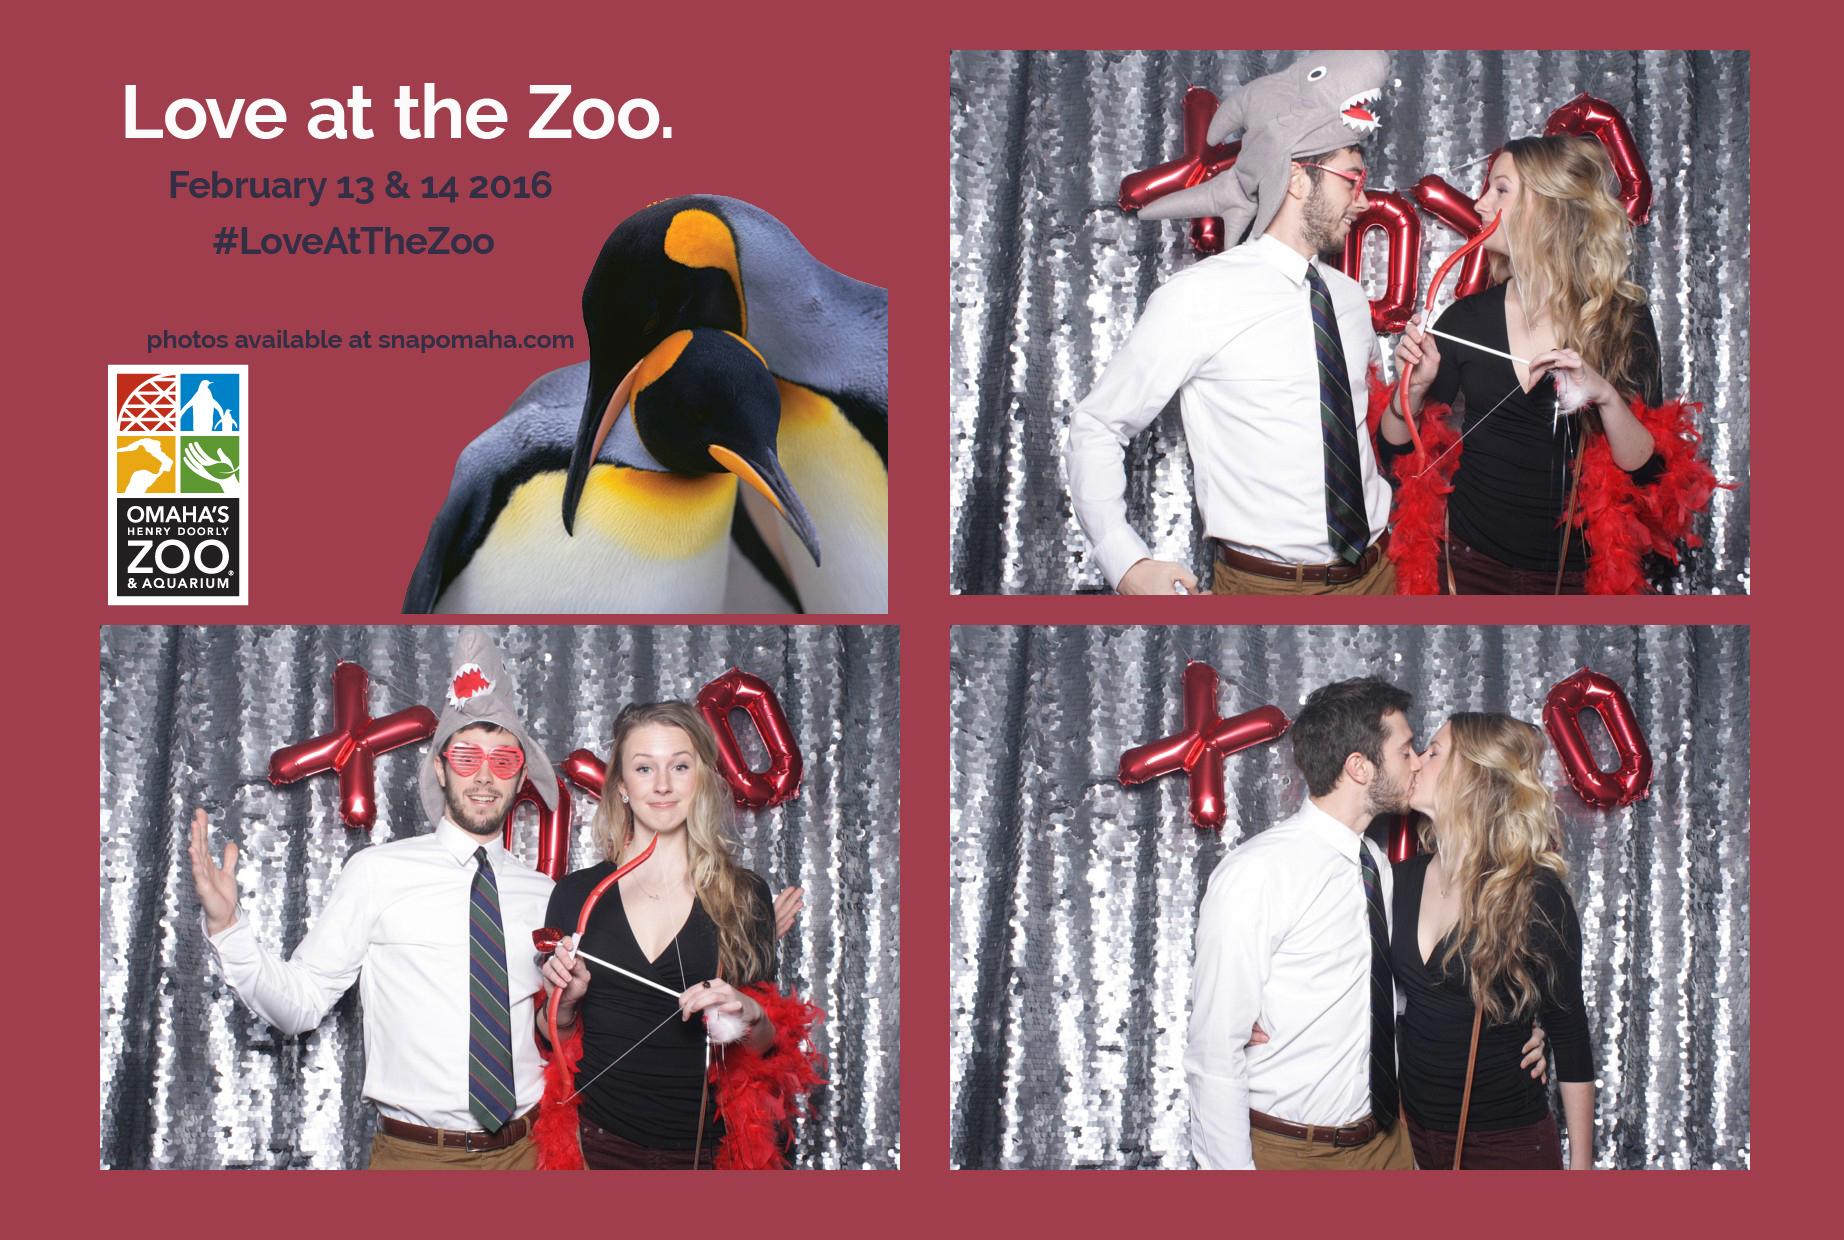 omaha zoo love at the zoo